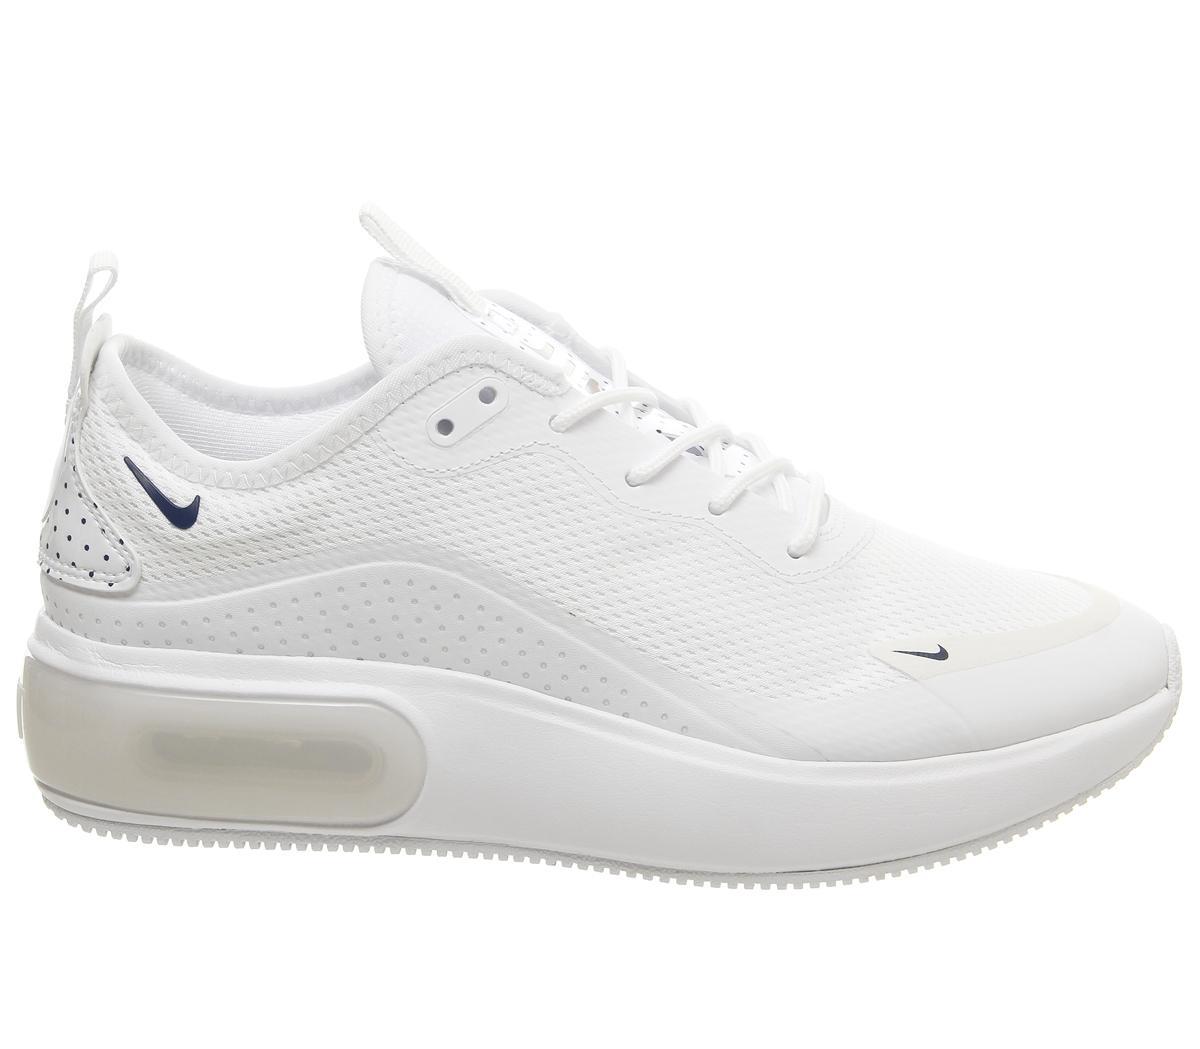 Nike Air Max Motion LW SE Atmosphäre Grau Weiß